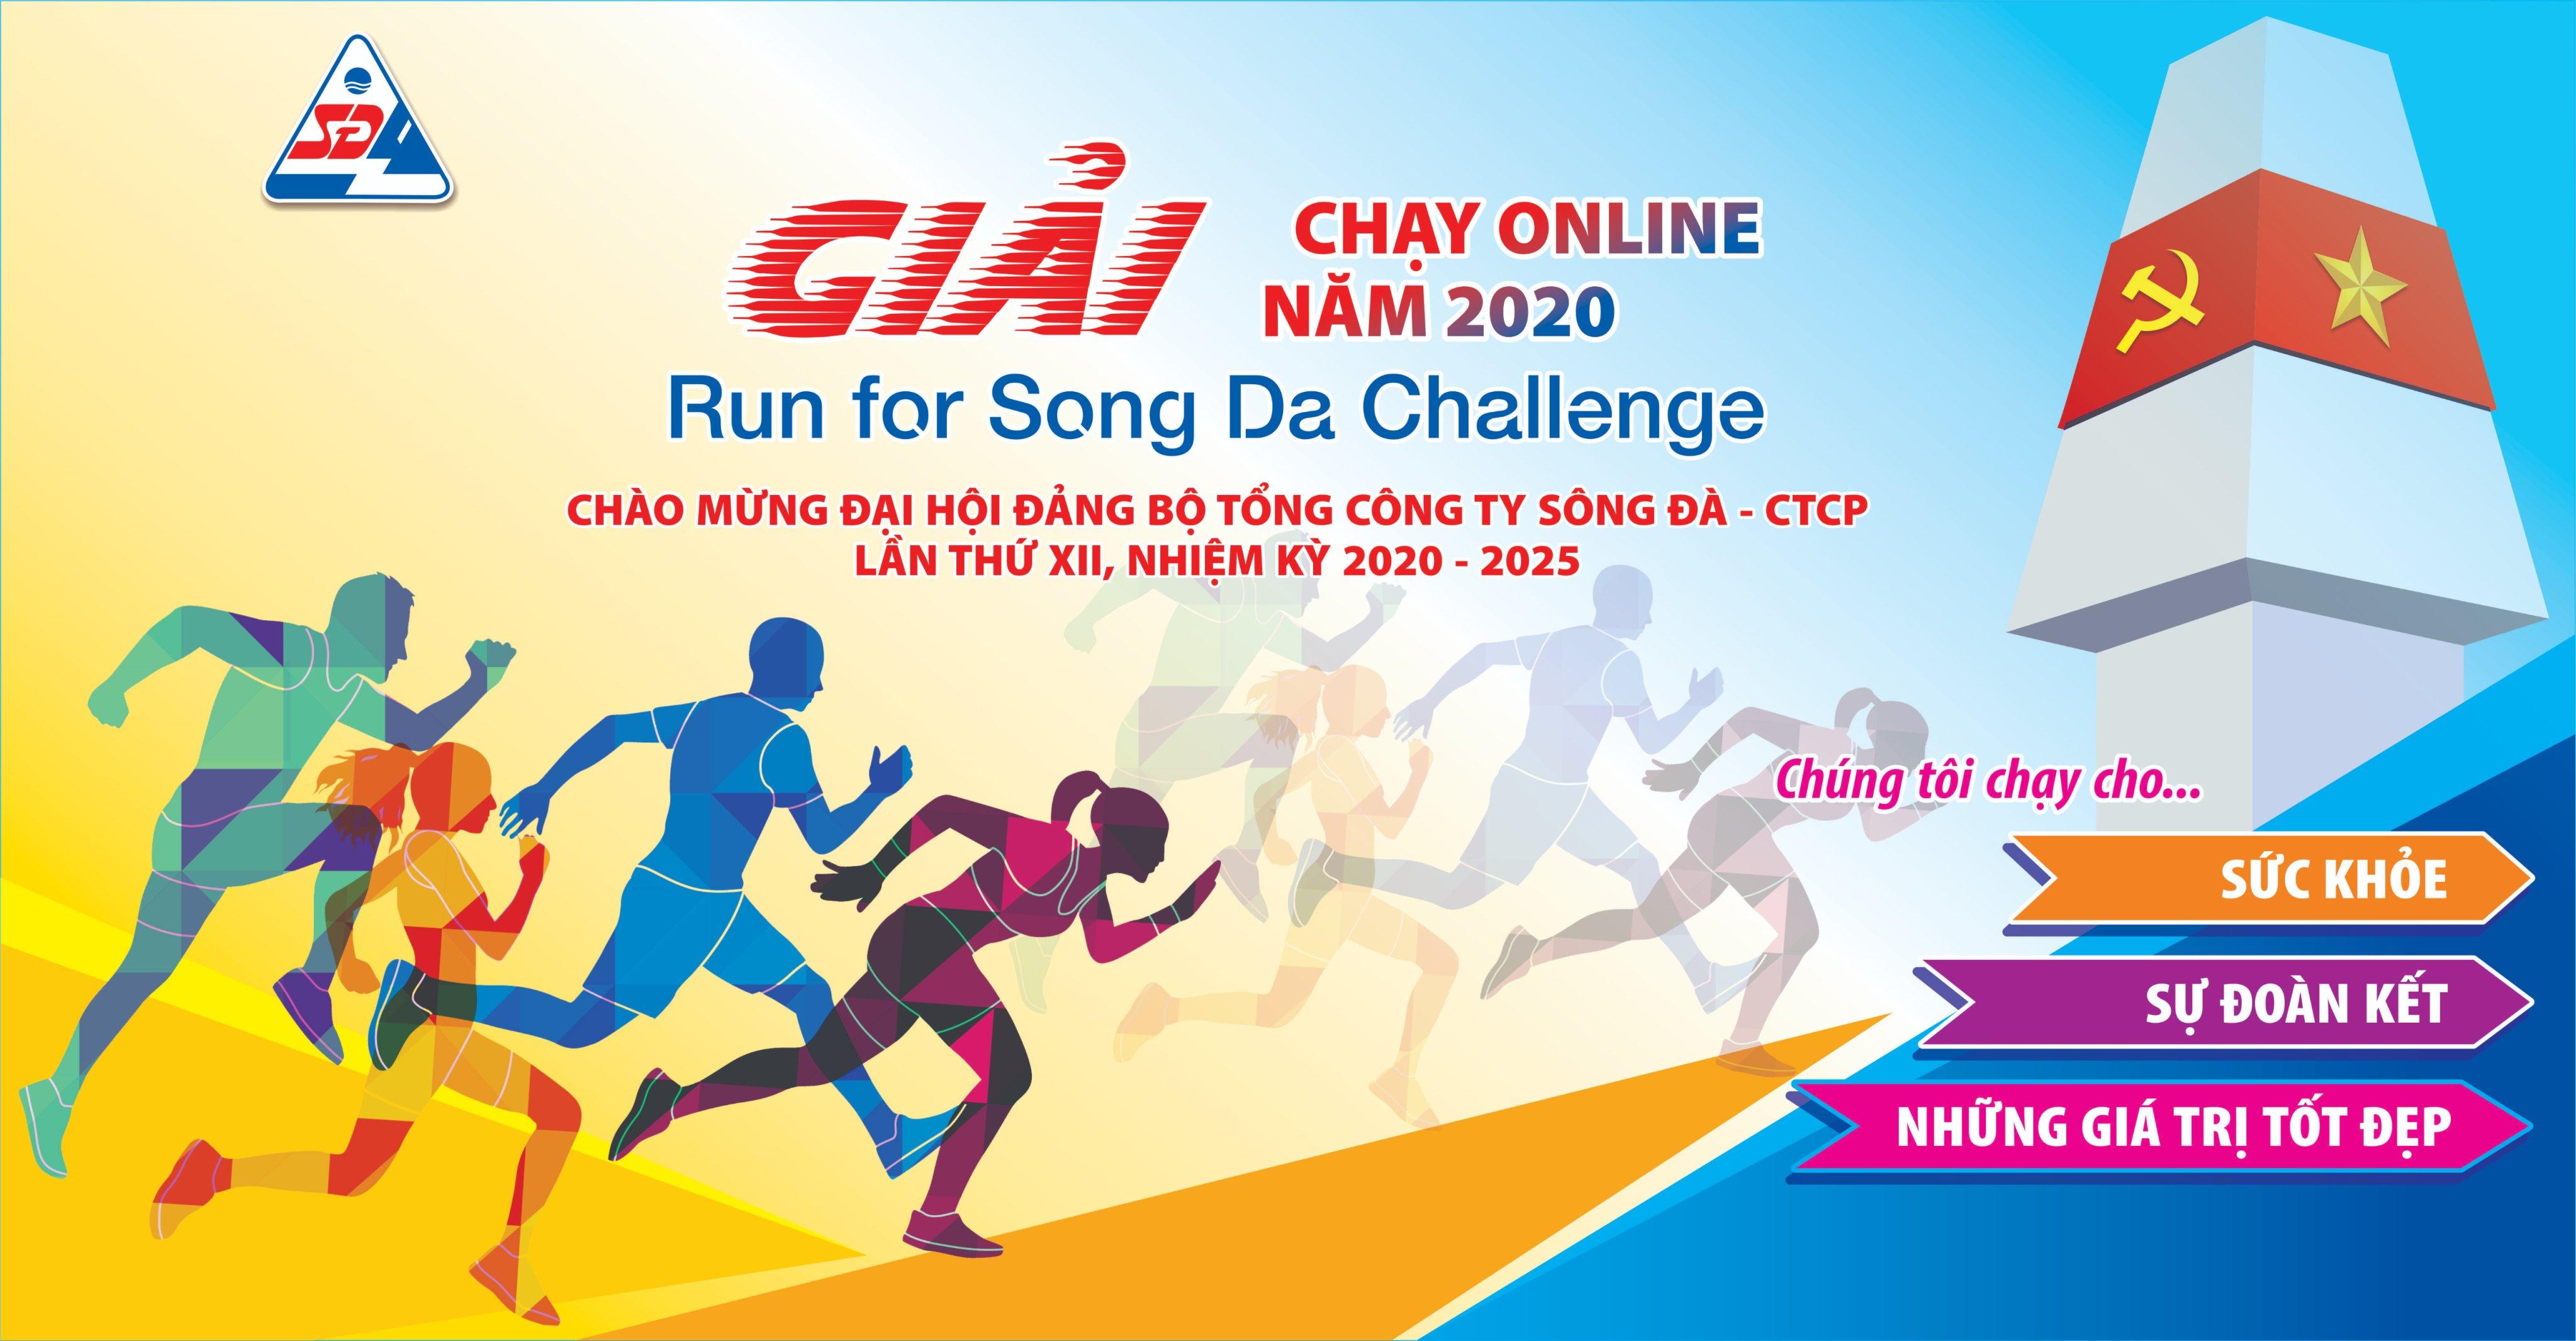 Run for Song Da Challenge